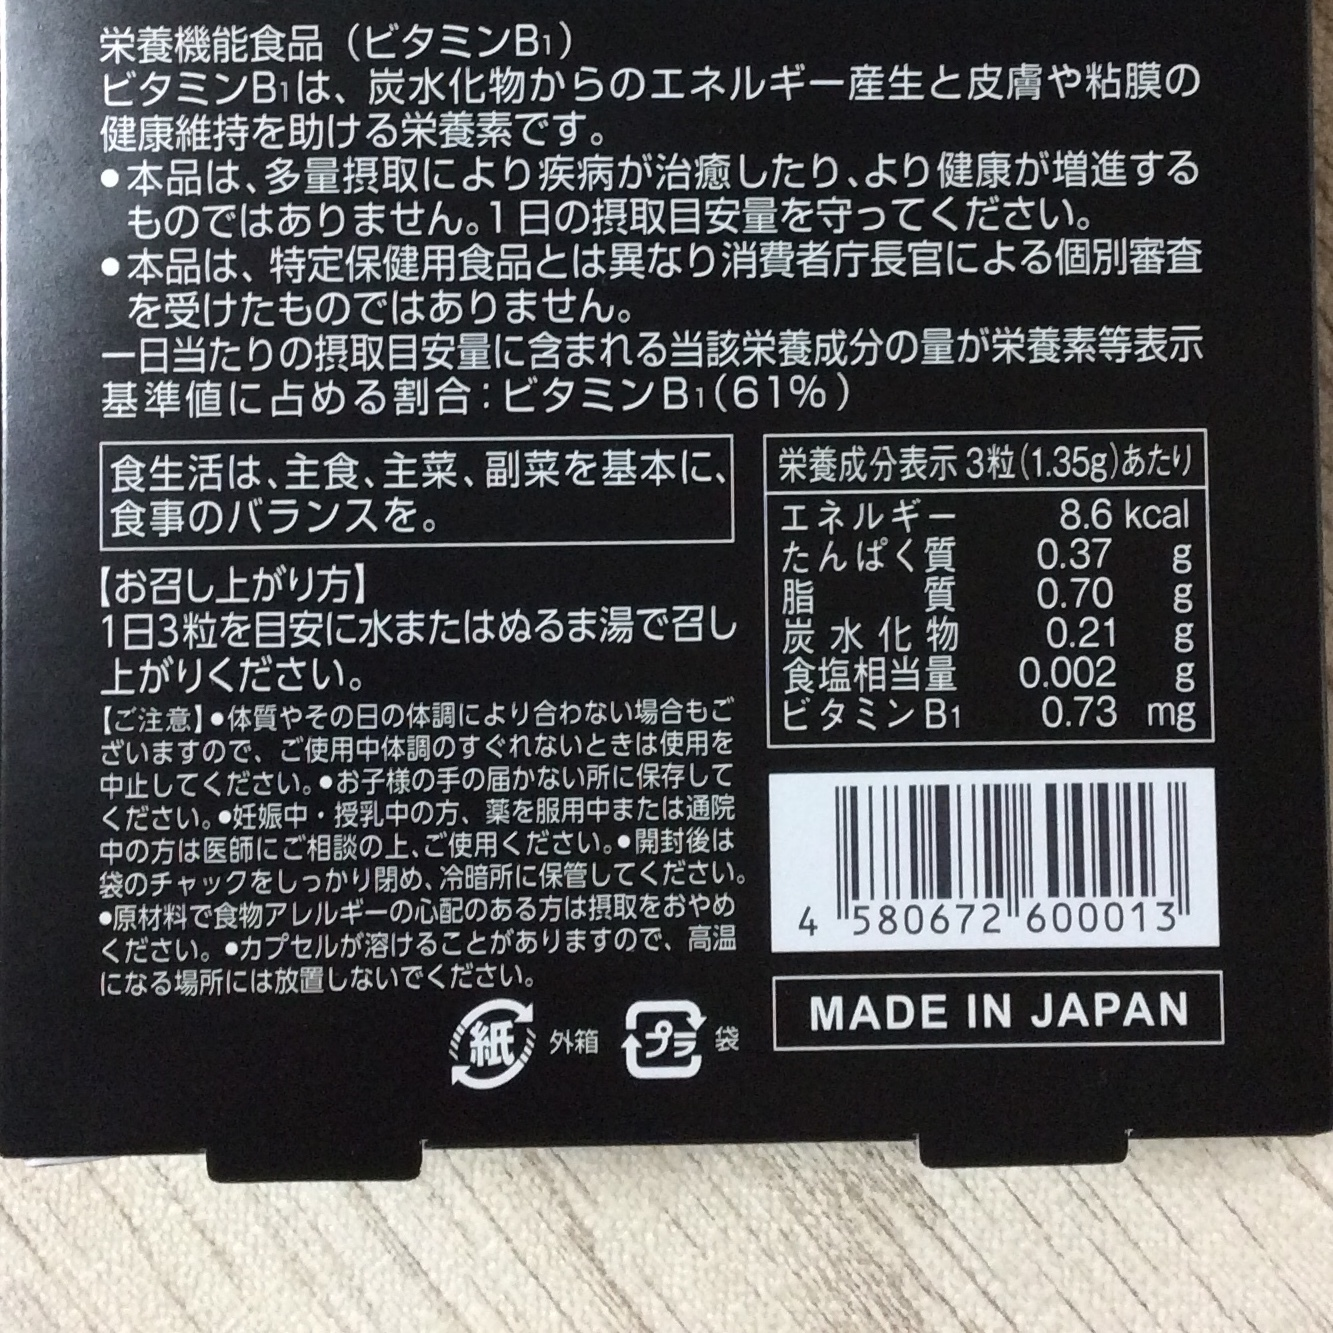 2BB34CD9-3DCE-42CE-813D-B0F4CB271B87.jpeg